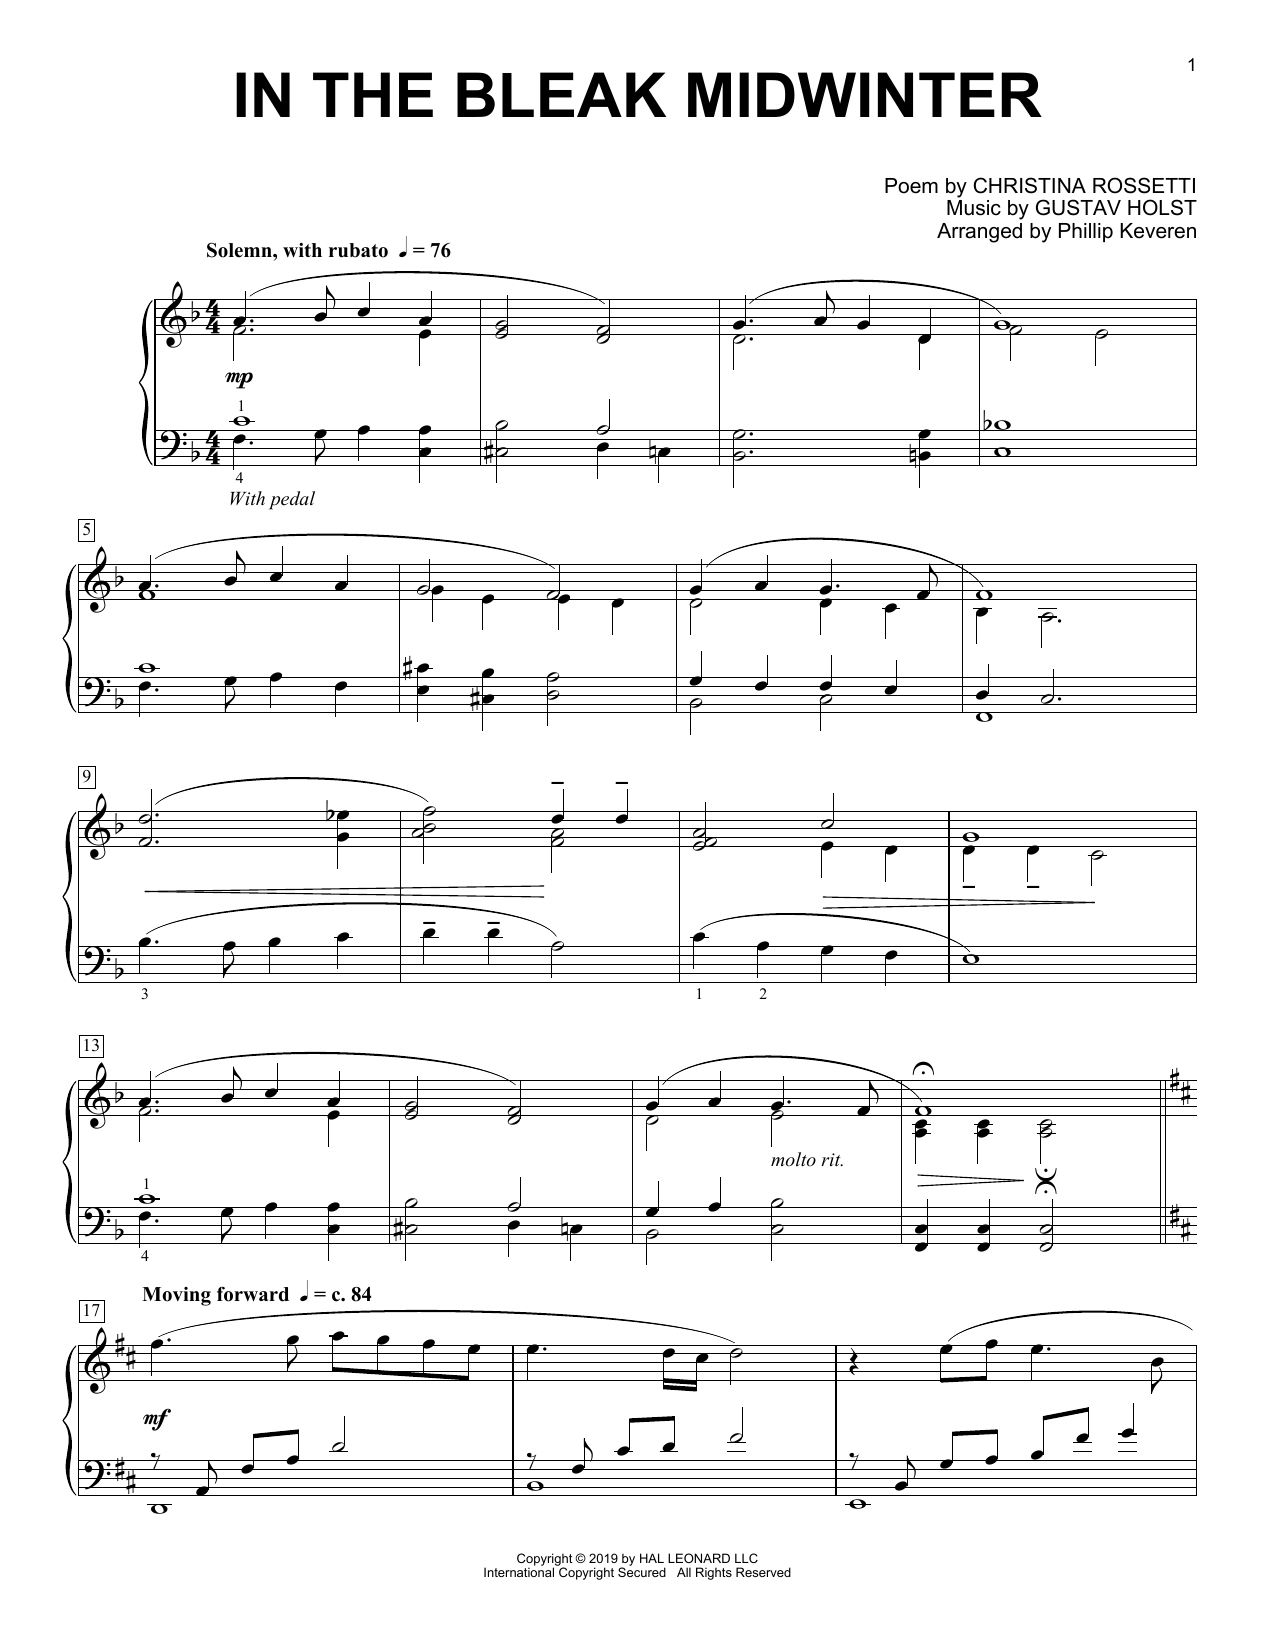 In The Bleak Midwinter [Classical version] (arr. Phillip Keveren) (Piano Solo)